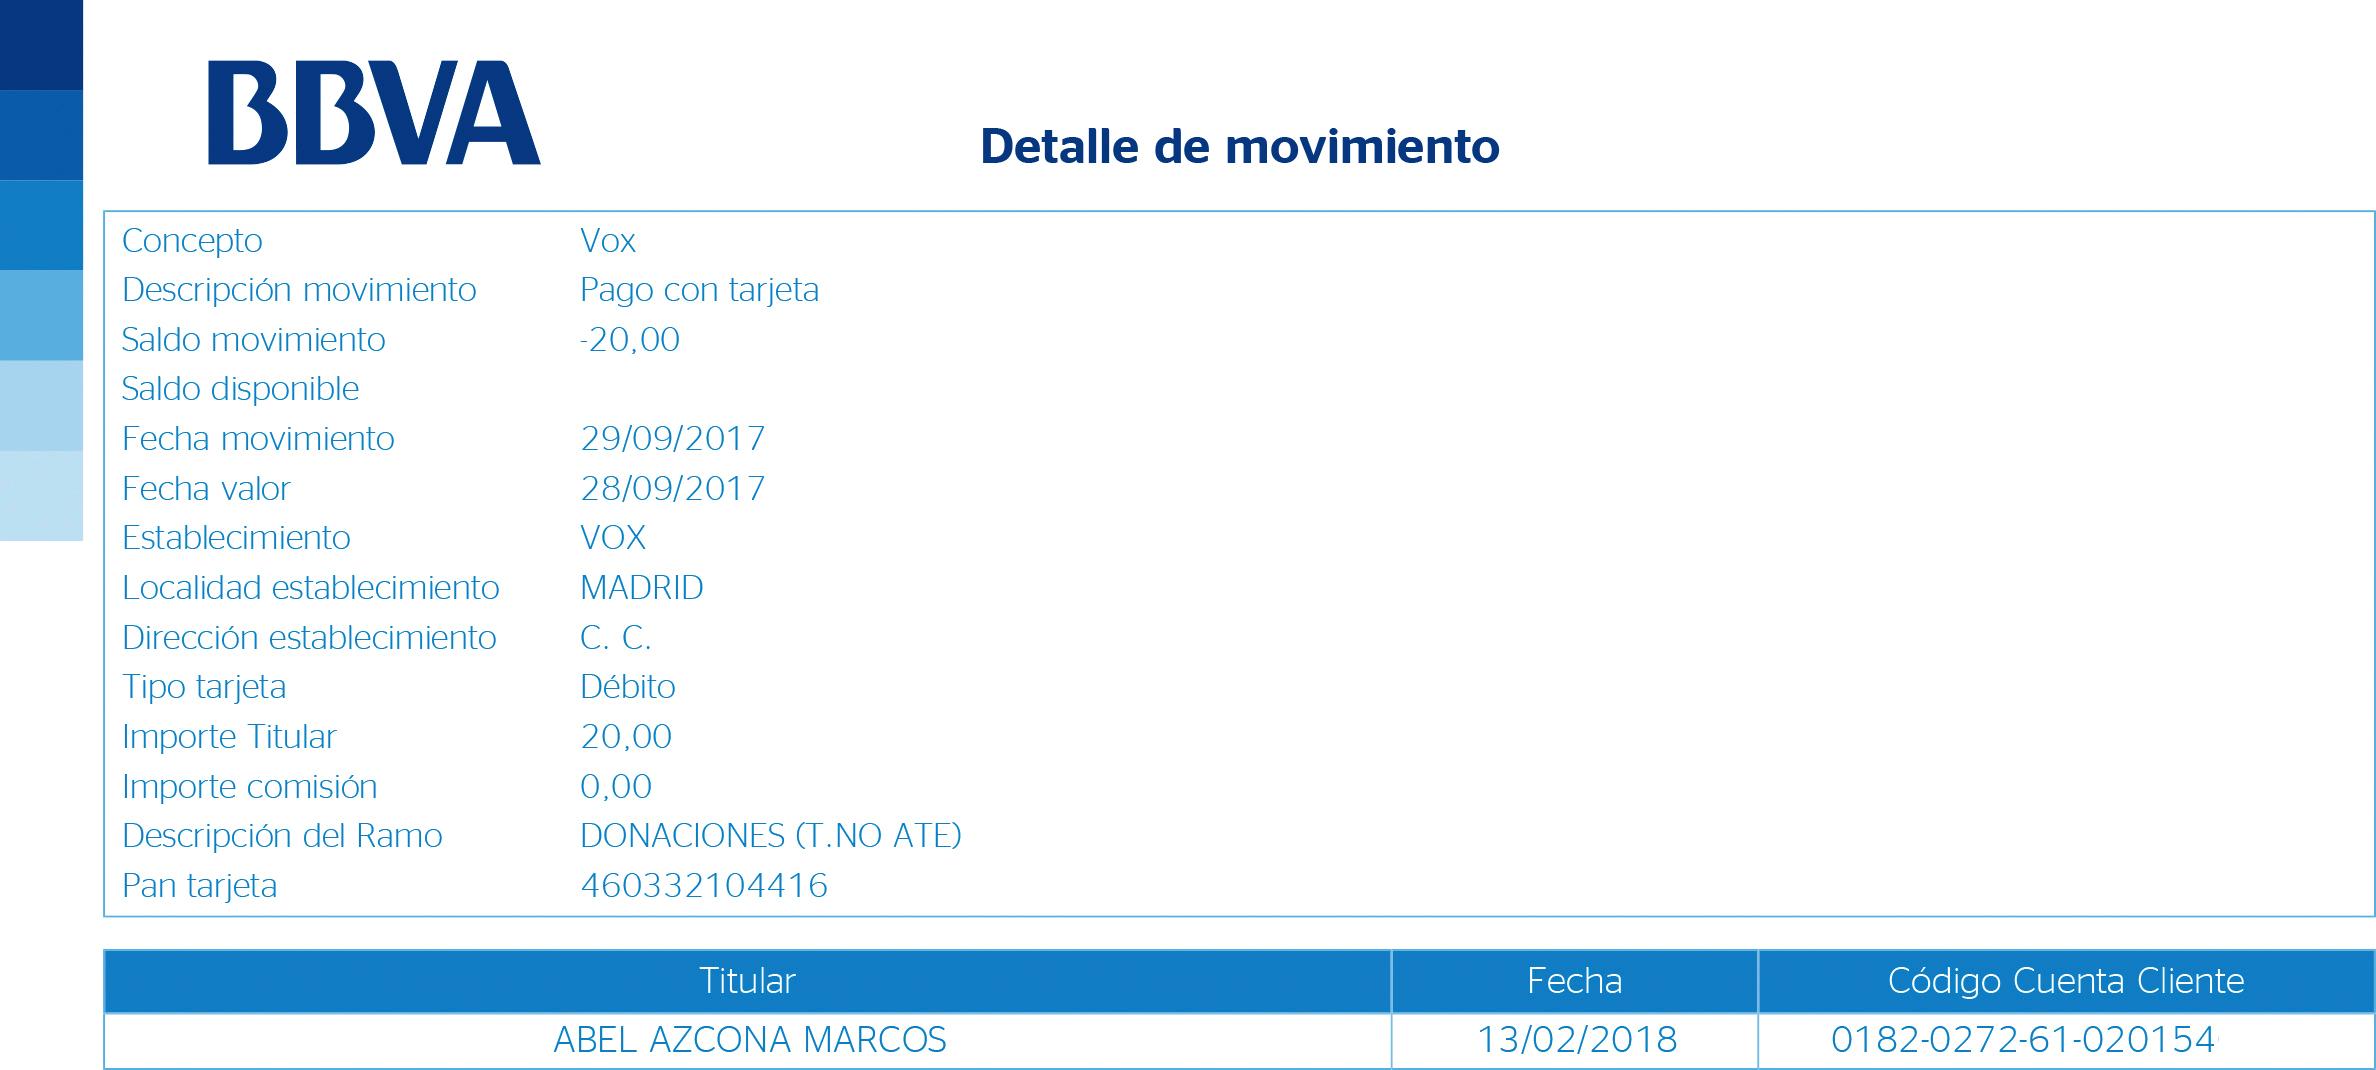 Donación / Cuota a VOX cobrada al afiliado Abel Azcona.